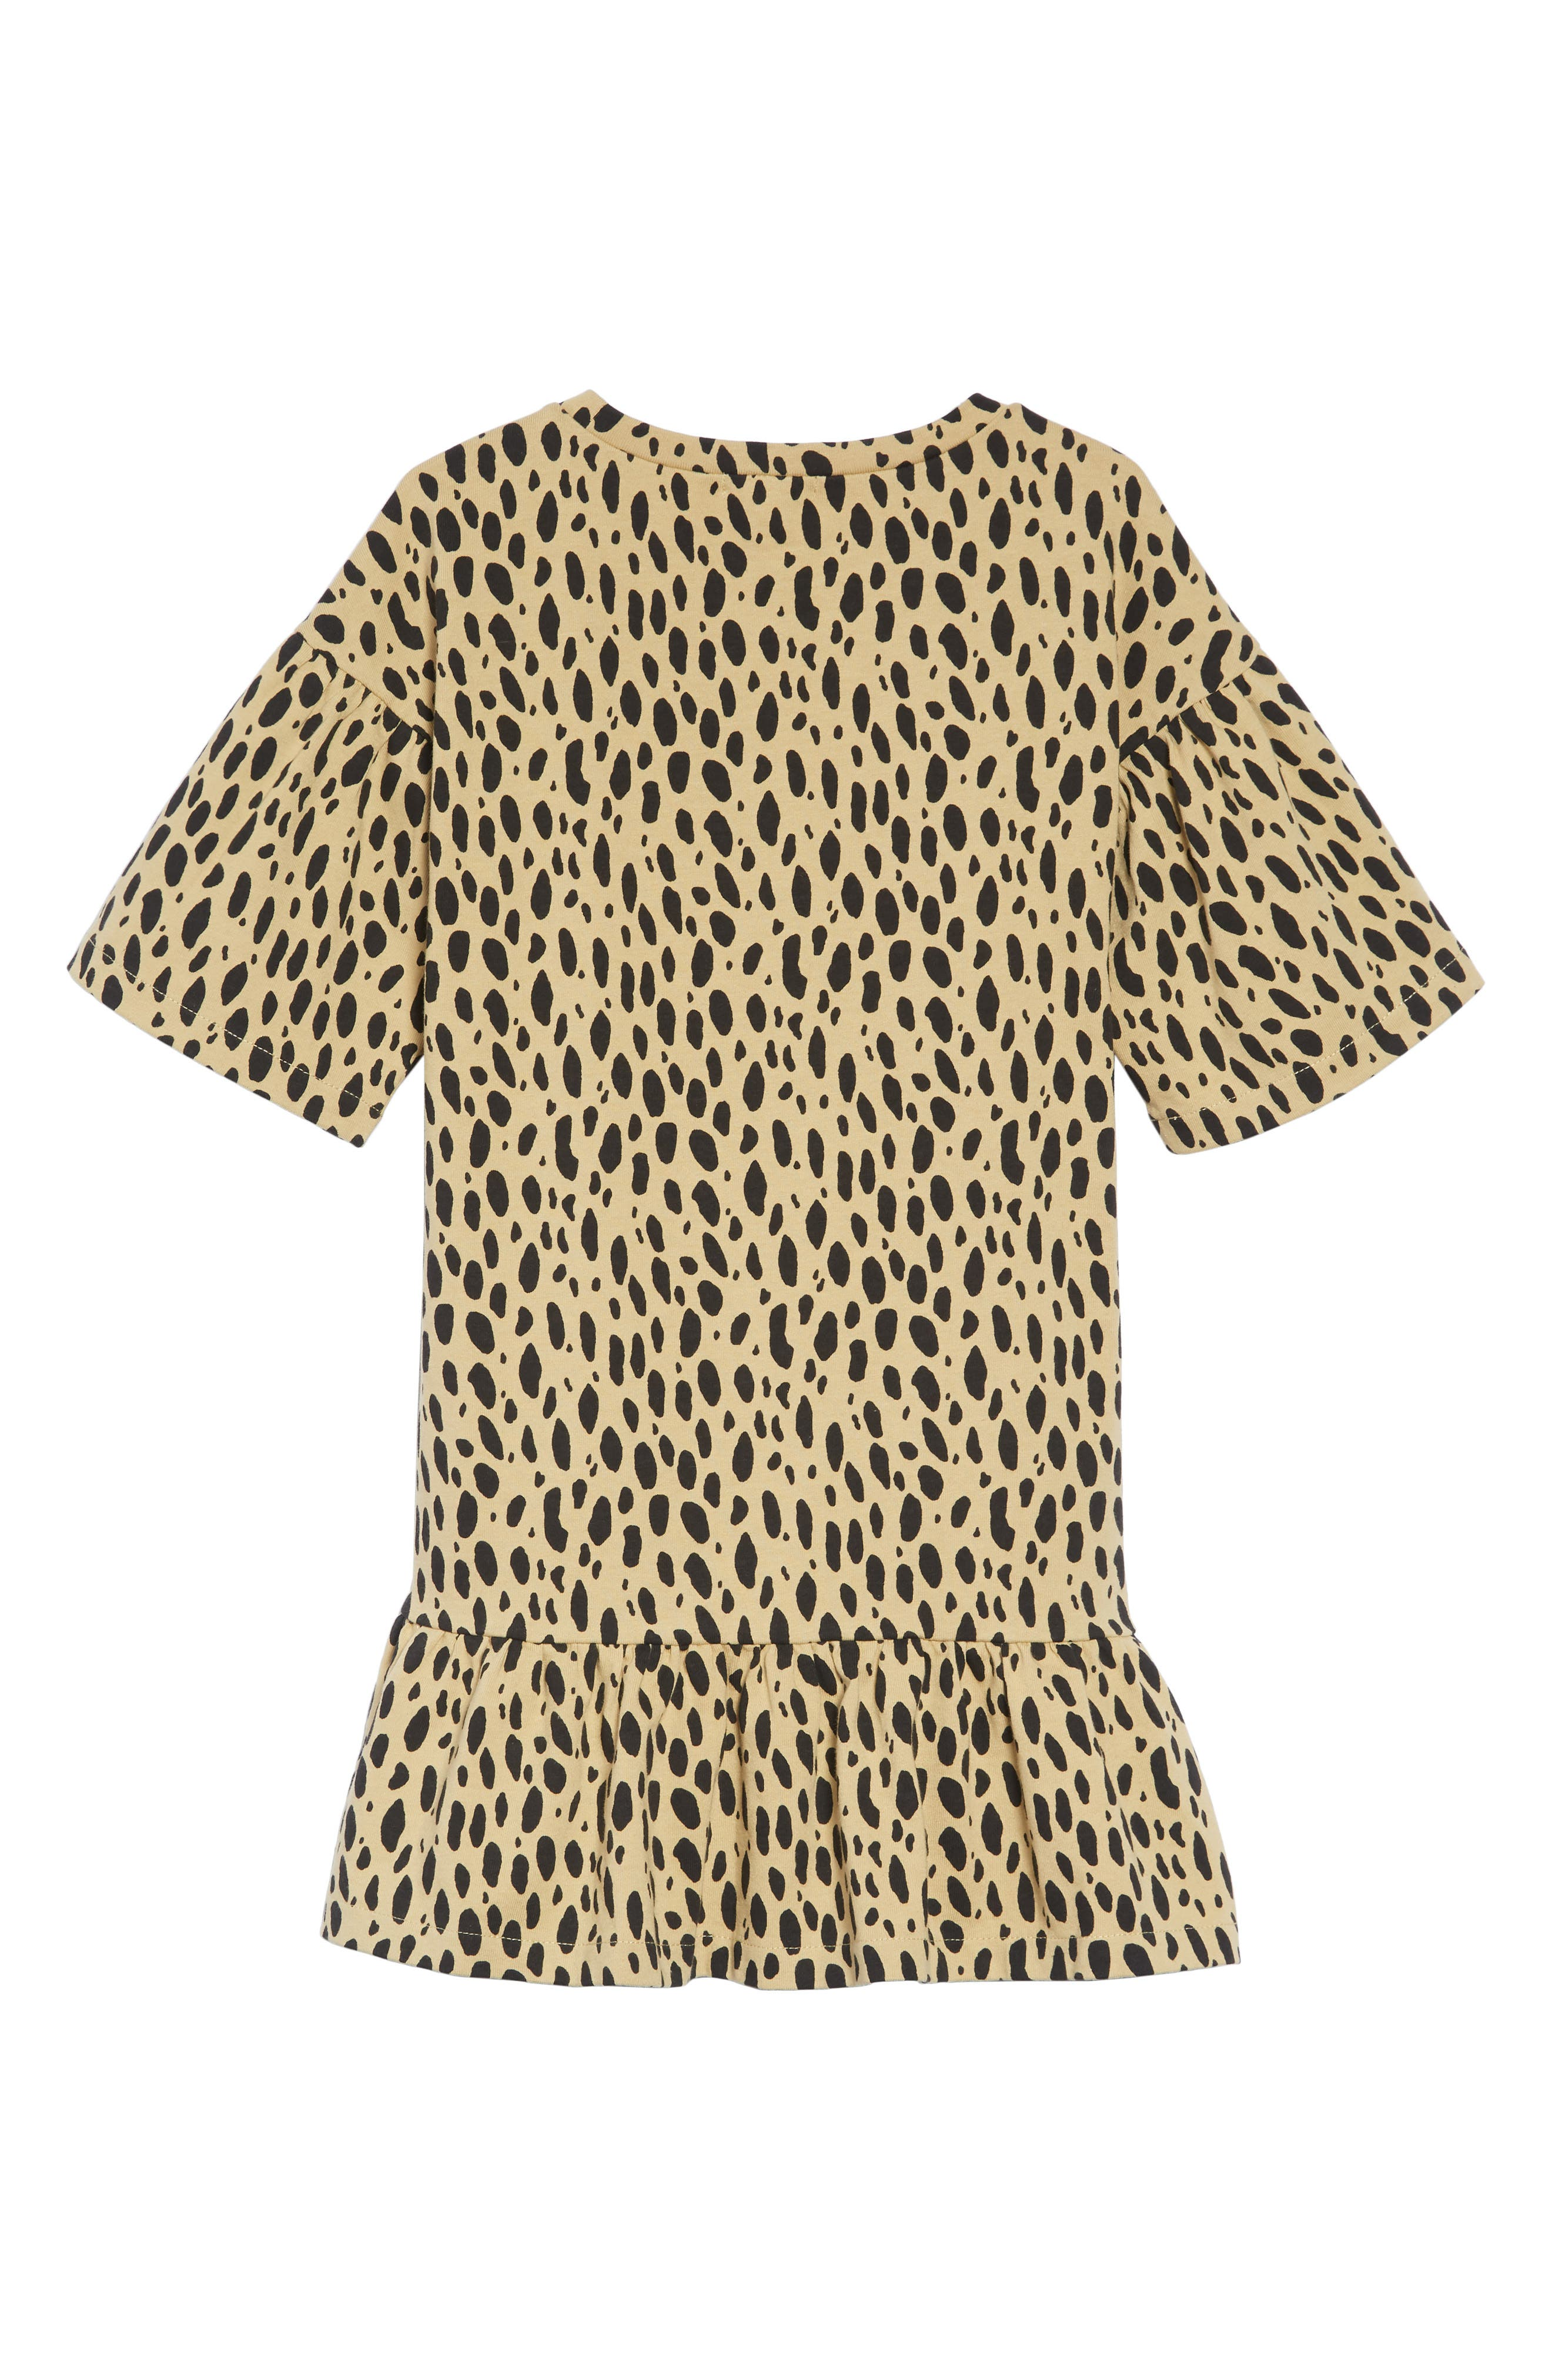 Drop Waist Dress,                             Alternate thumbnail 2, color,                             250